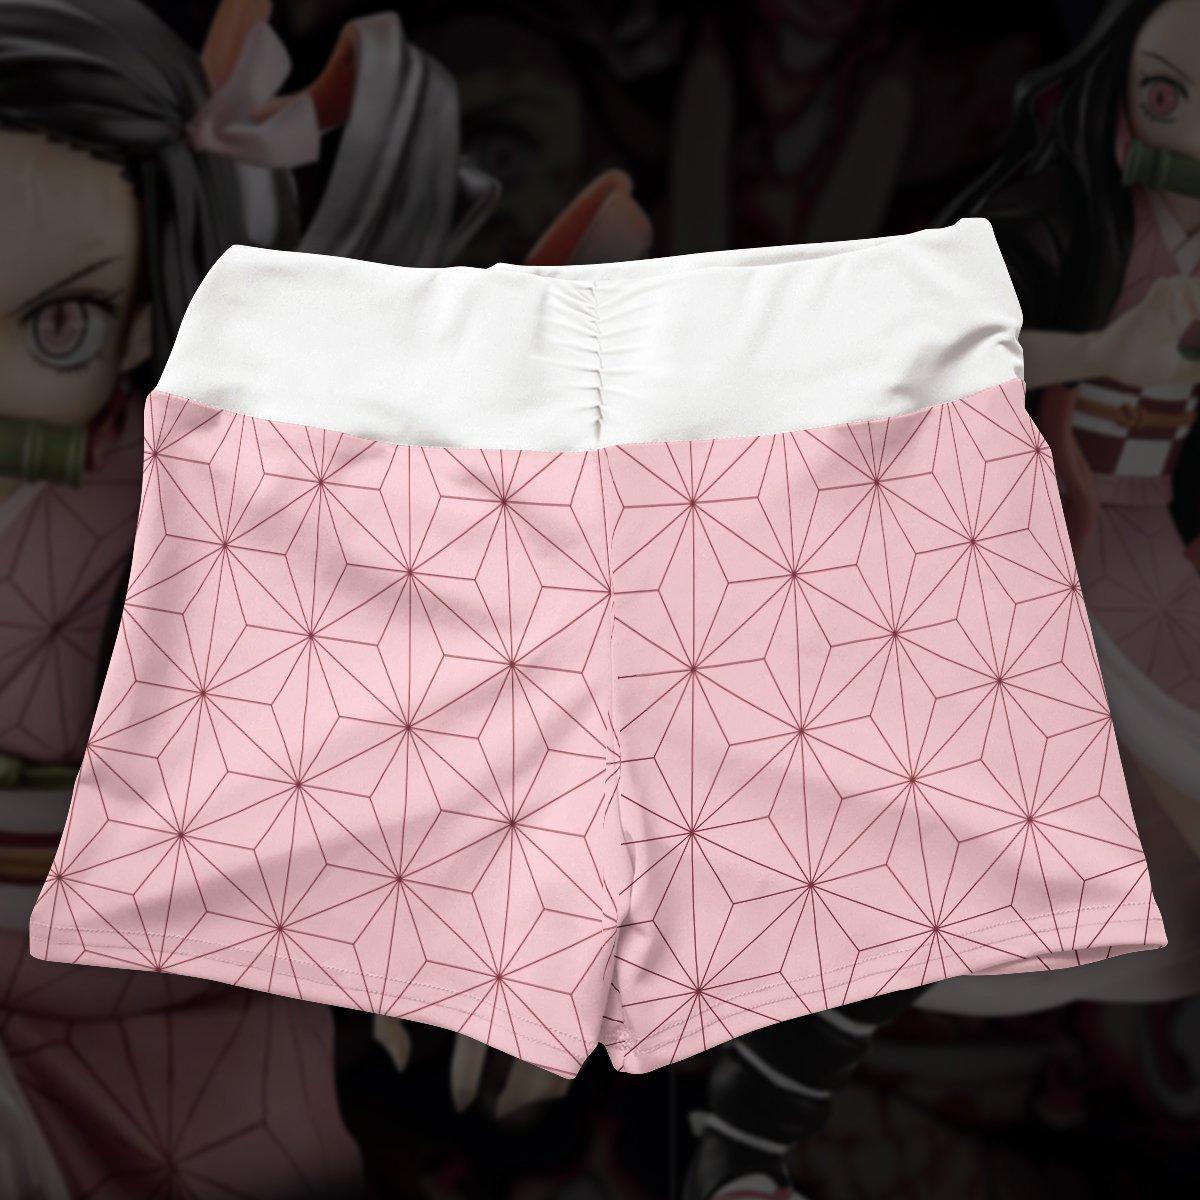 summer nezuko active wear set 319941 - Anime Swimsuits